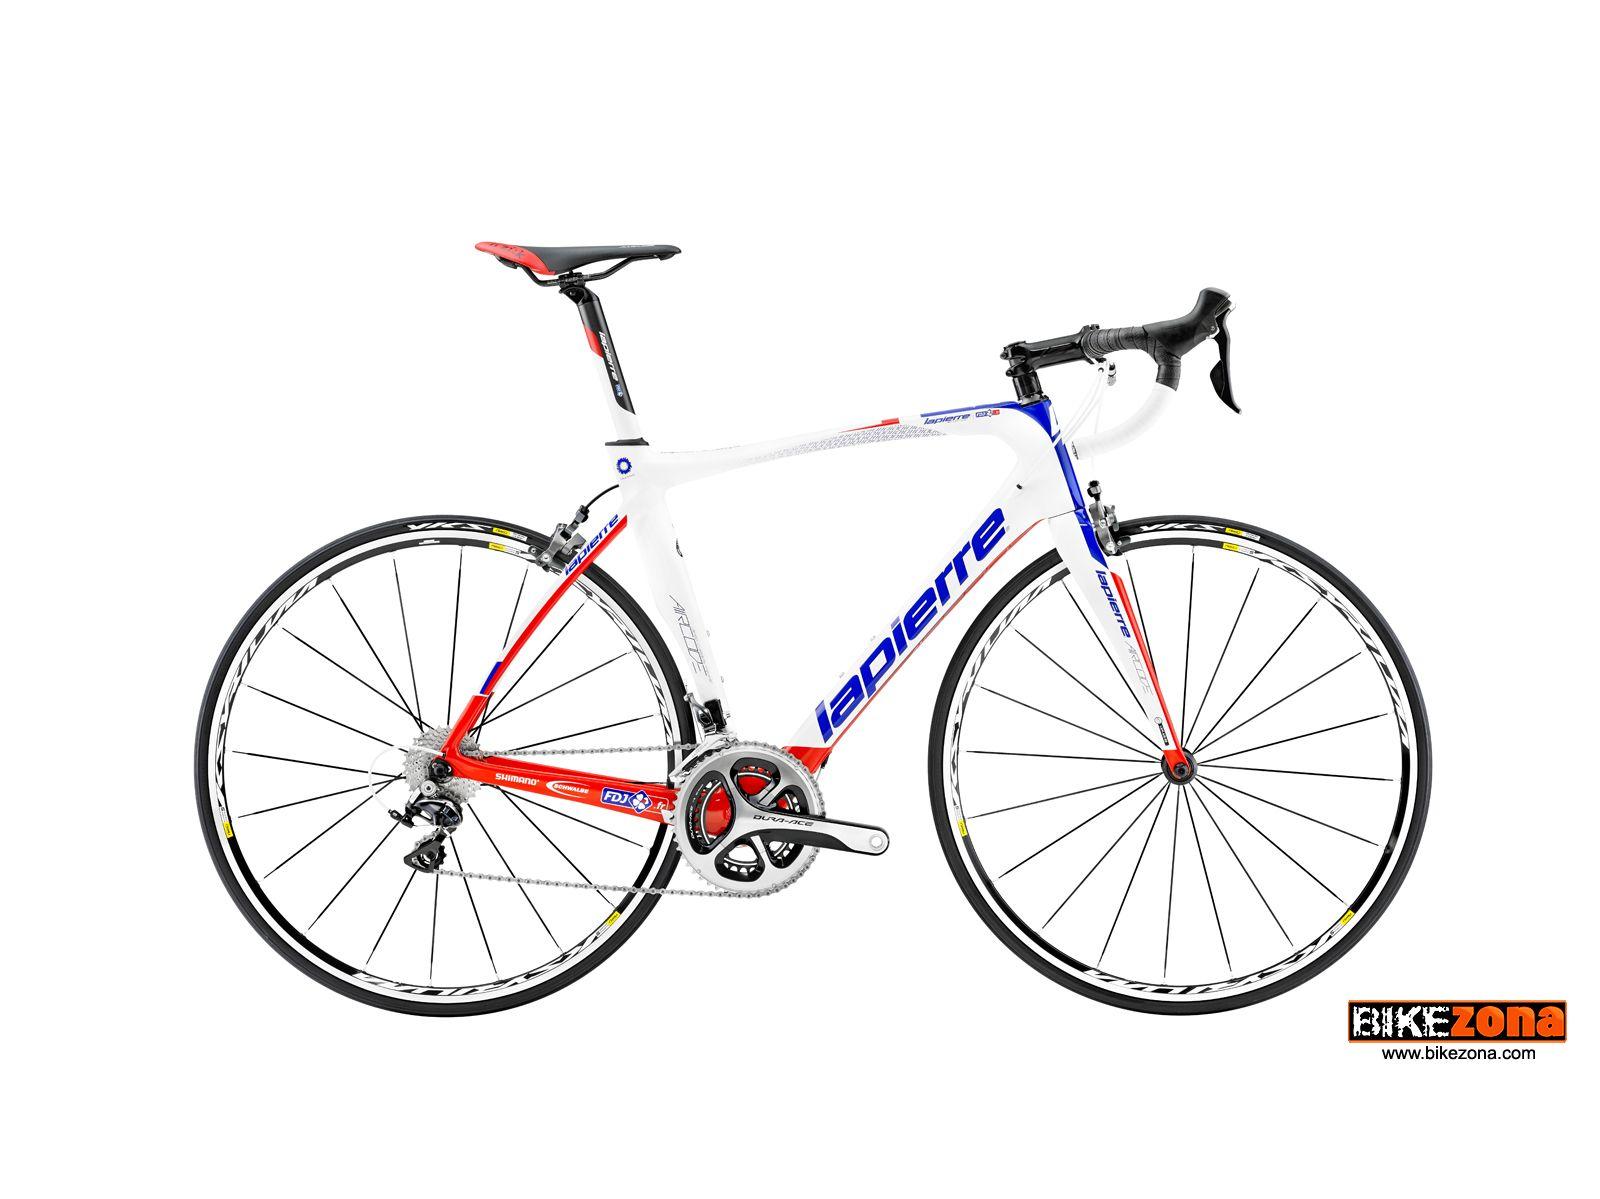 lapierre aircode 500 fdj 2015 bicicletas carretera catal go bicicletas en. Black Bedroom Furniture Sets. Home Design Ideas